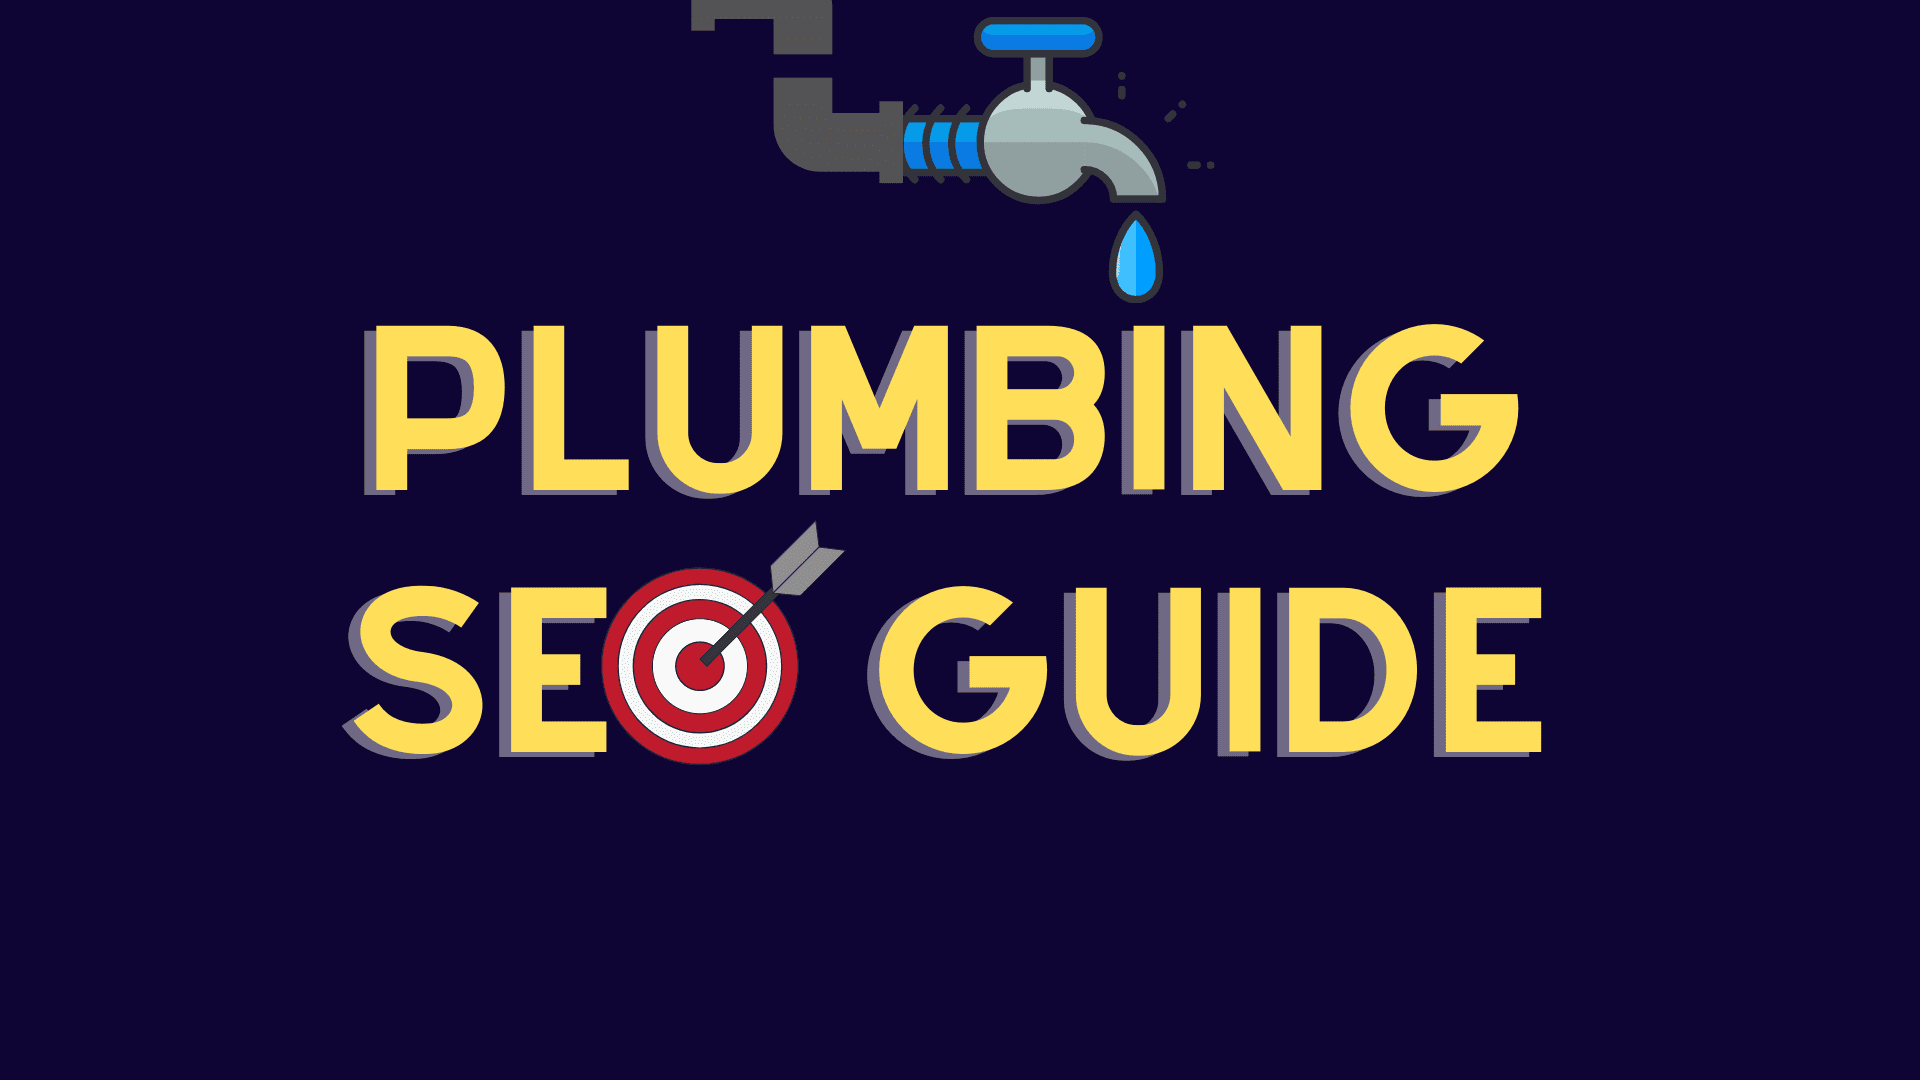 plumbing seo guide